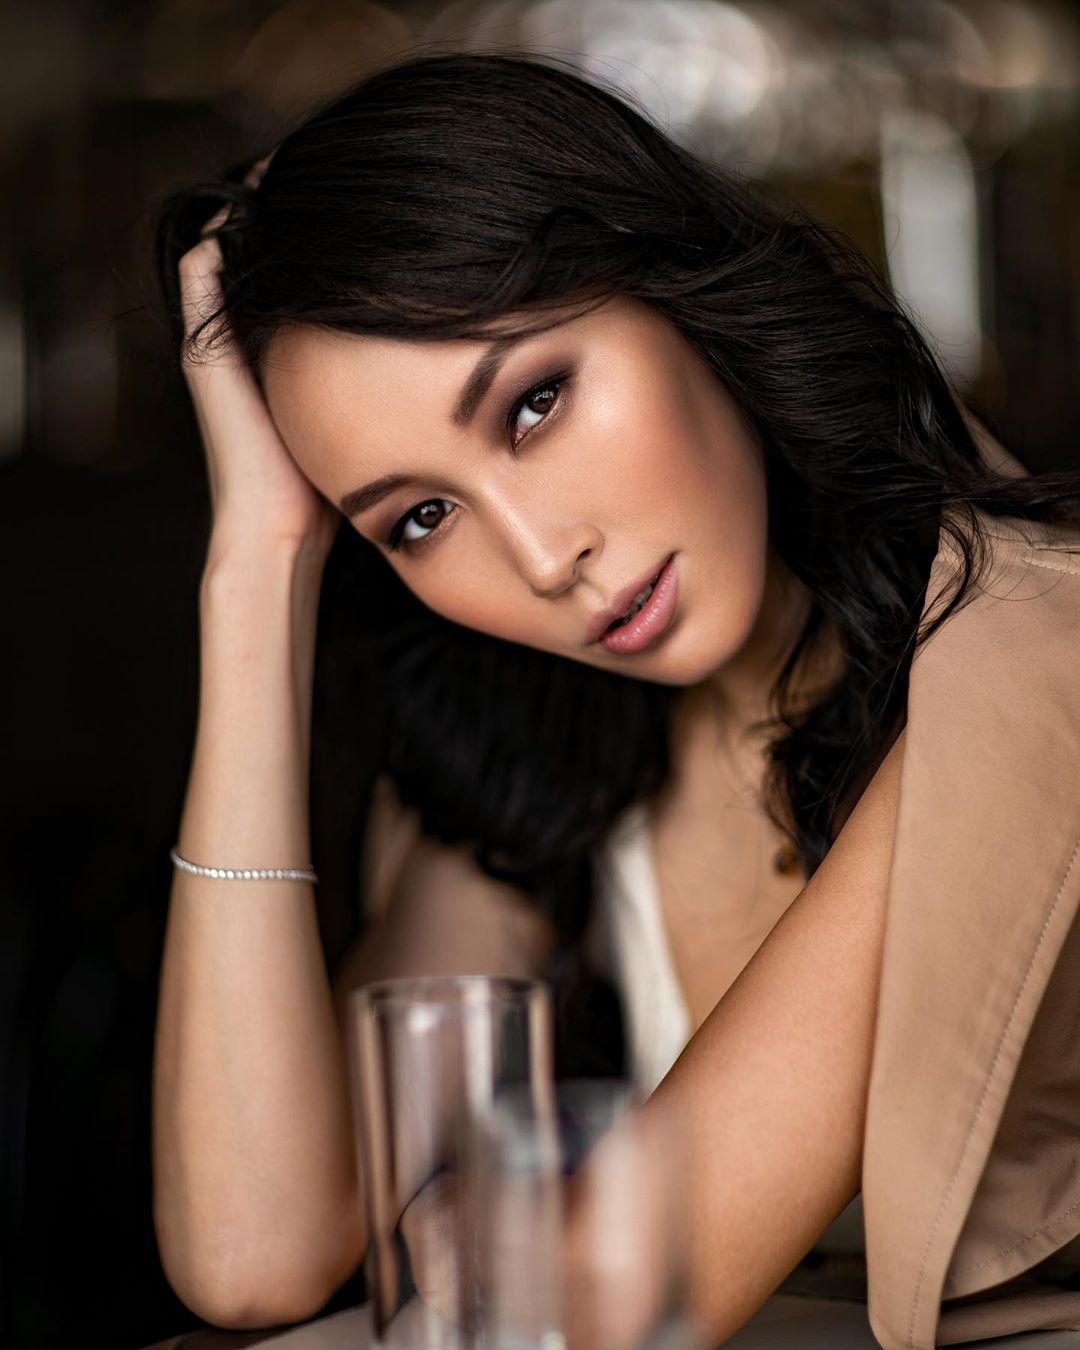 Красавица Сардана Макарова стала многодетной матерью